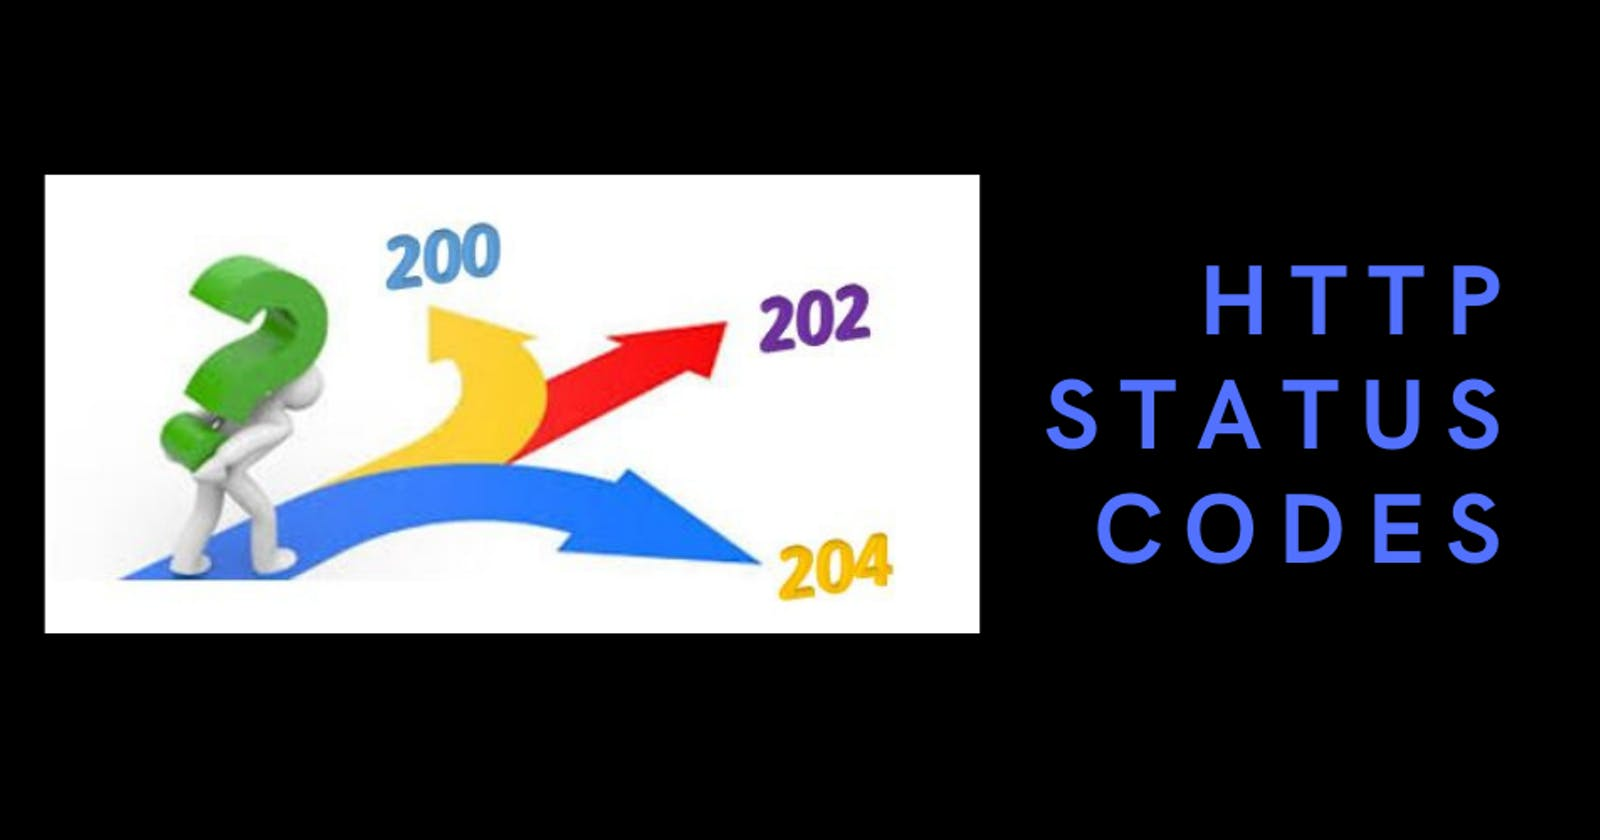 HTTP Status Codes :: 200 vs 202 vs 204